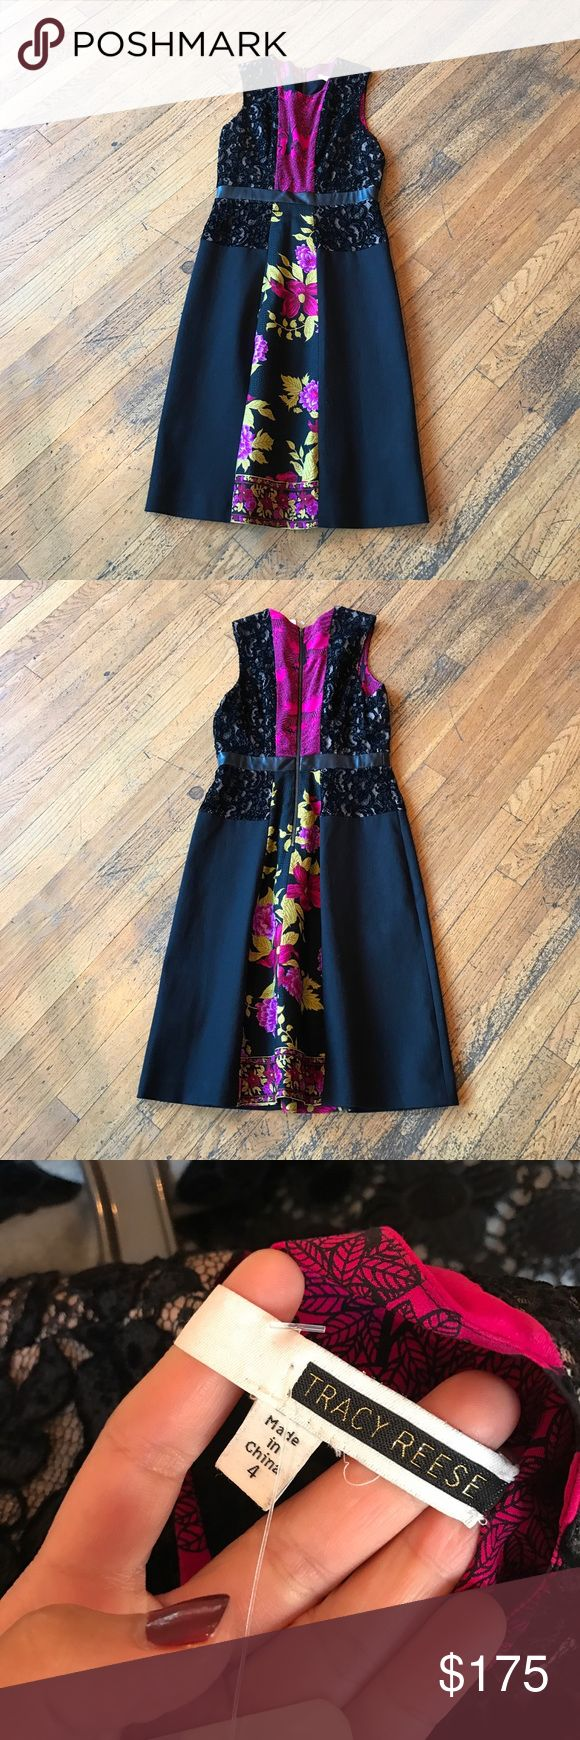 NWT Tracy Reese Dress Fun Tracy Reese Dress! Tracy Reese Dresses Midi